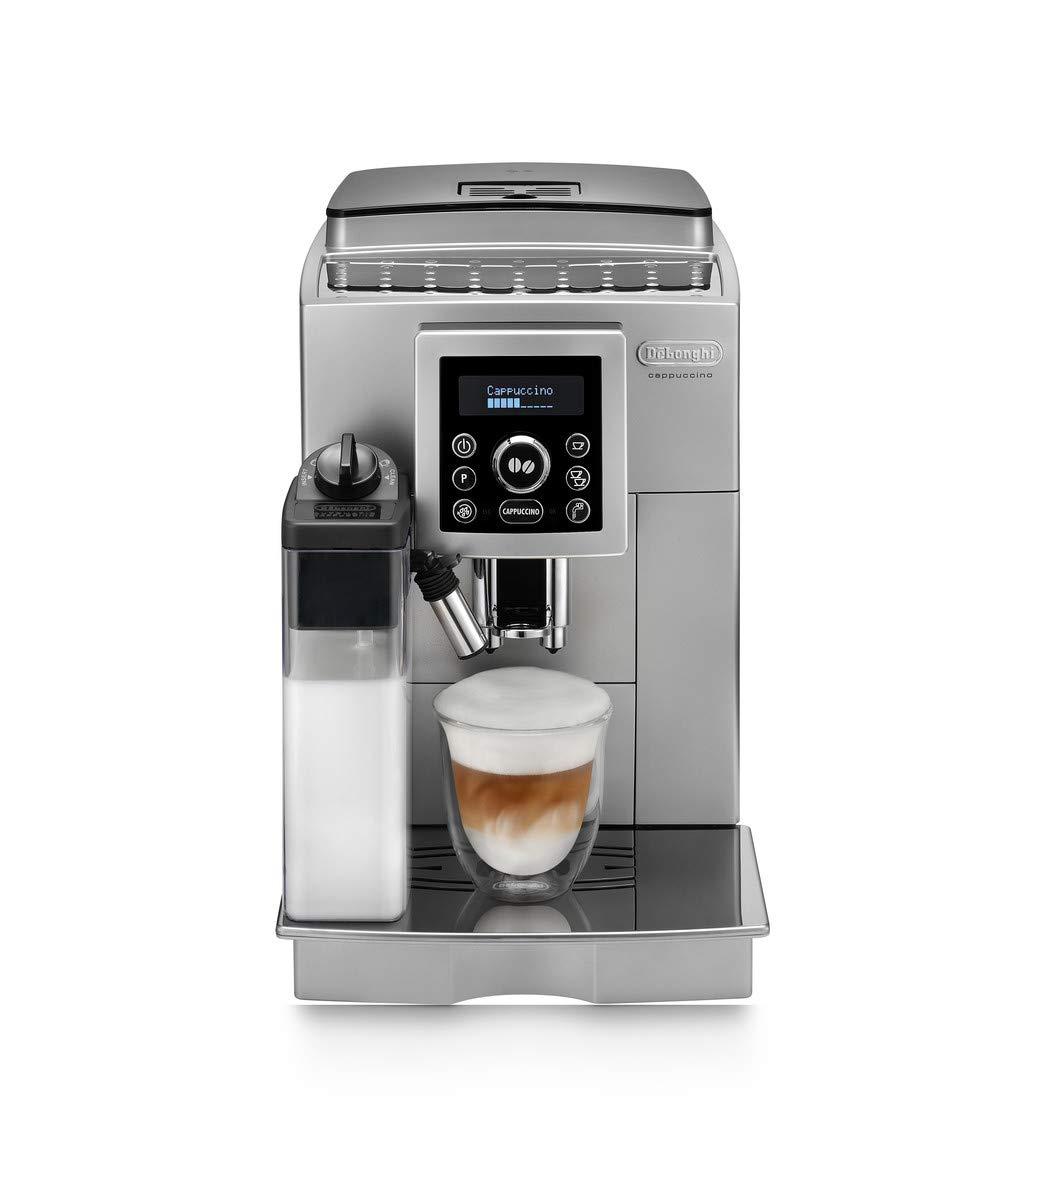 DeLonghi ECAM 23.460 S - Cafetera superautomática ...